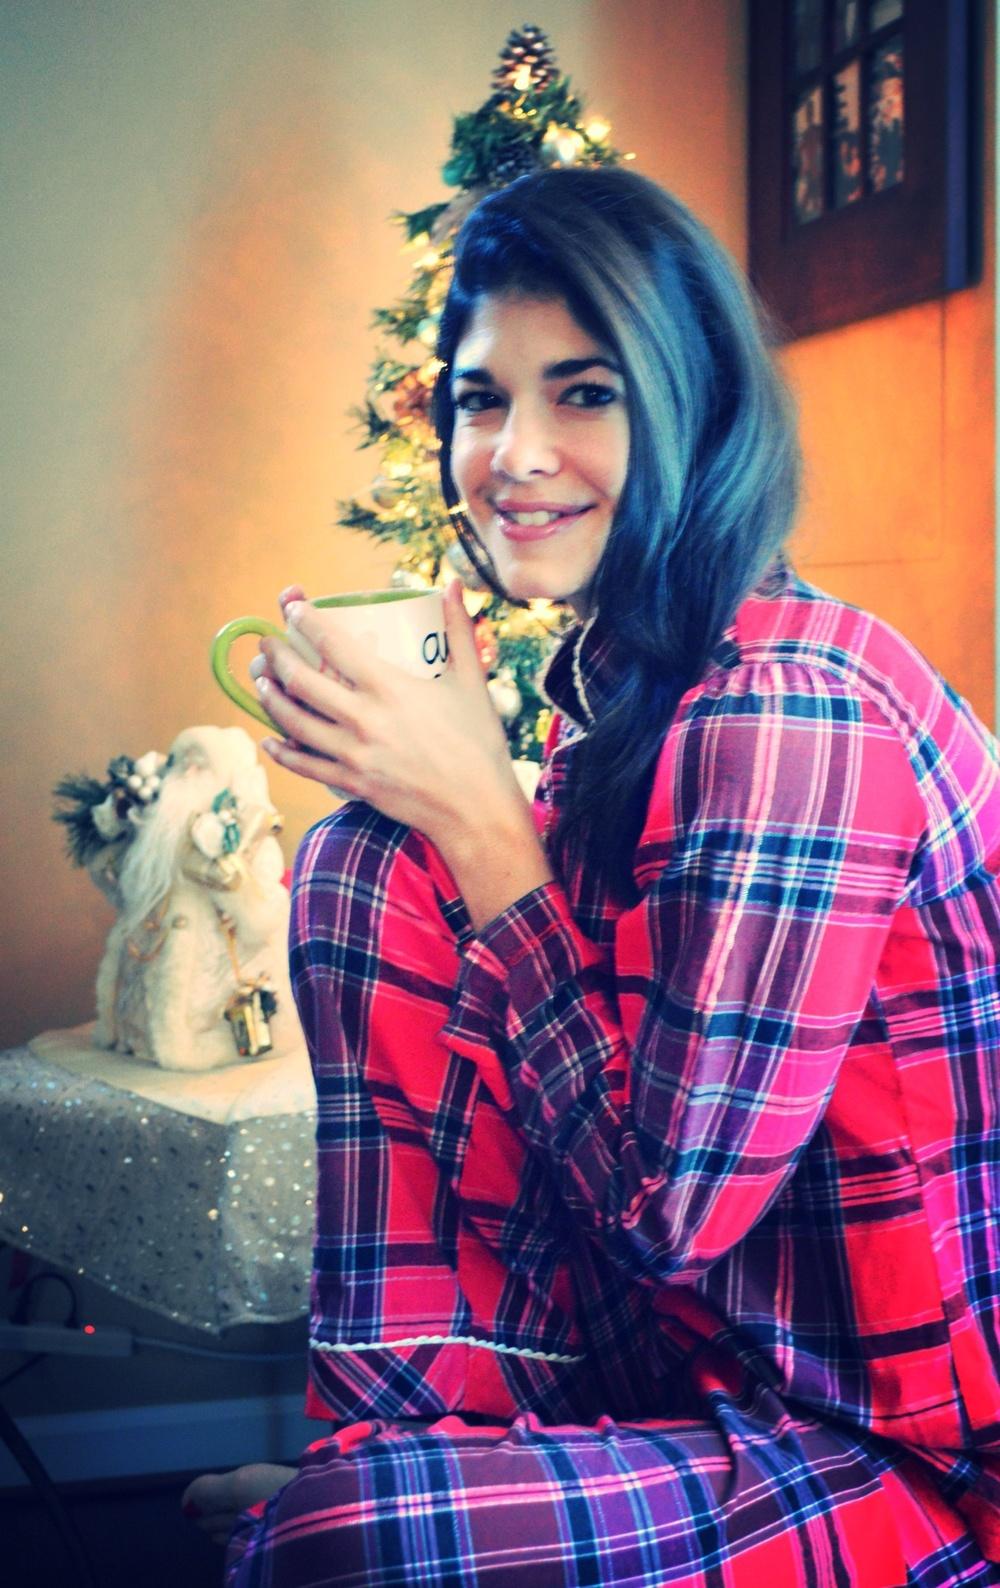 LS Christmas Morning